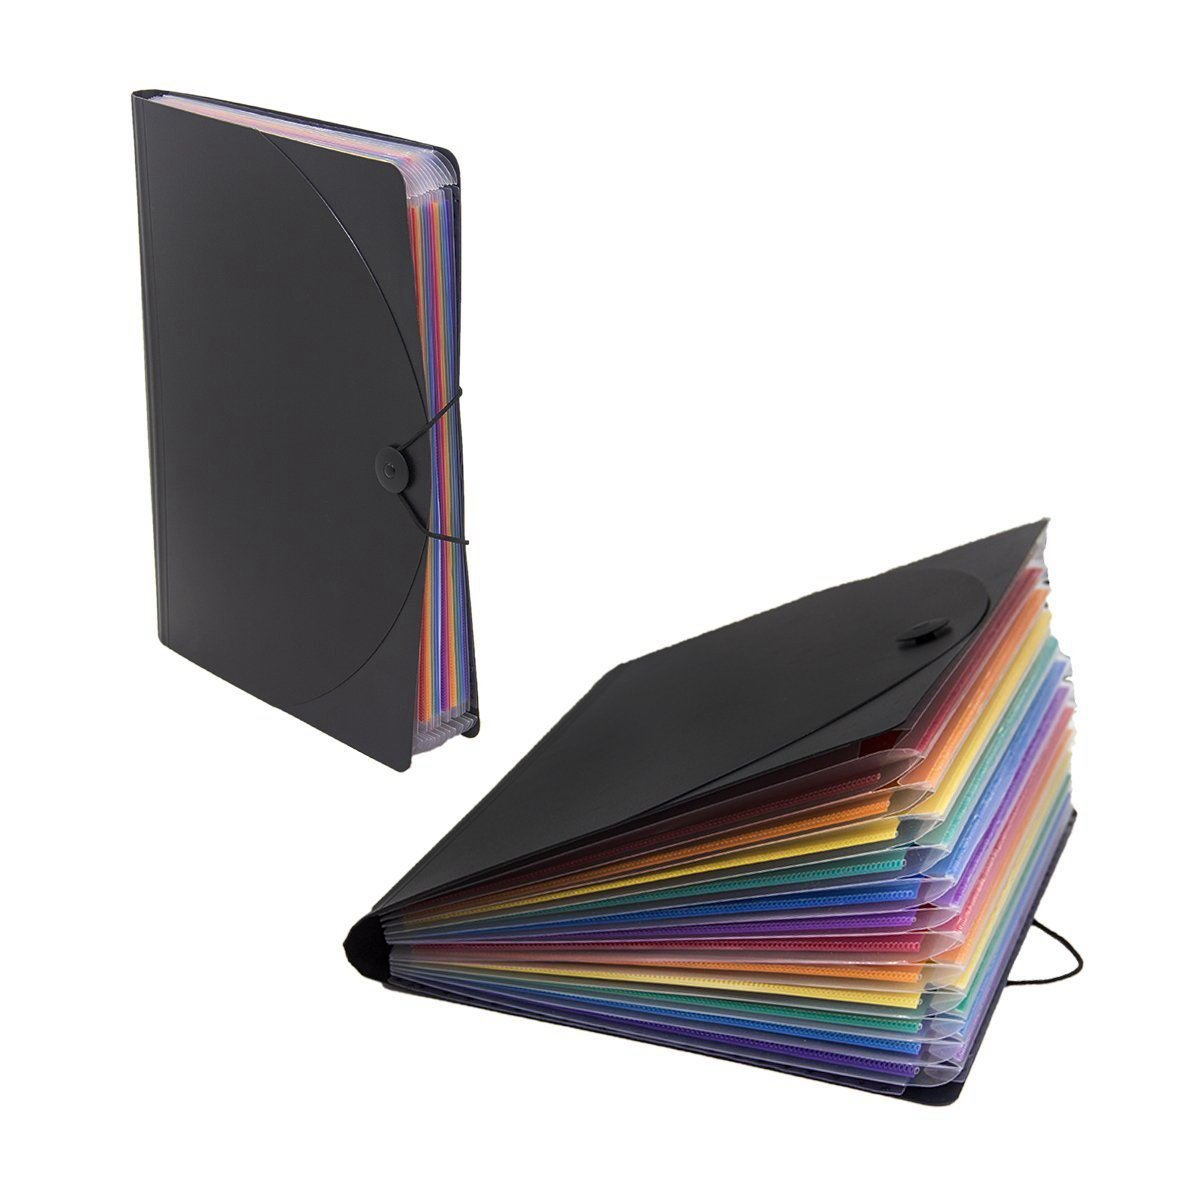 SODIAL 12 Pocket Expanding Files Folder/ A4 Expandable File Organizer/Portable Accordion File Folder/High Capacity Multicolour Stand/Plastic Business File Organizer